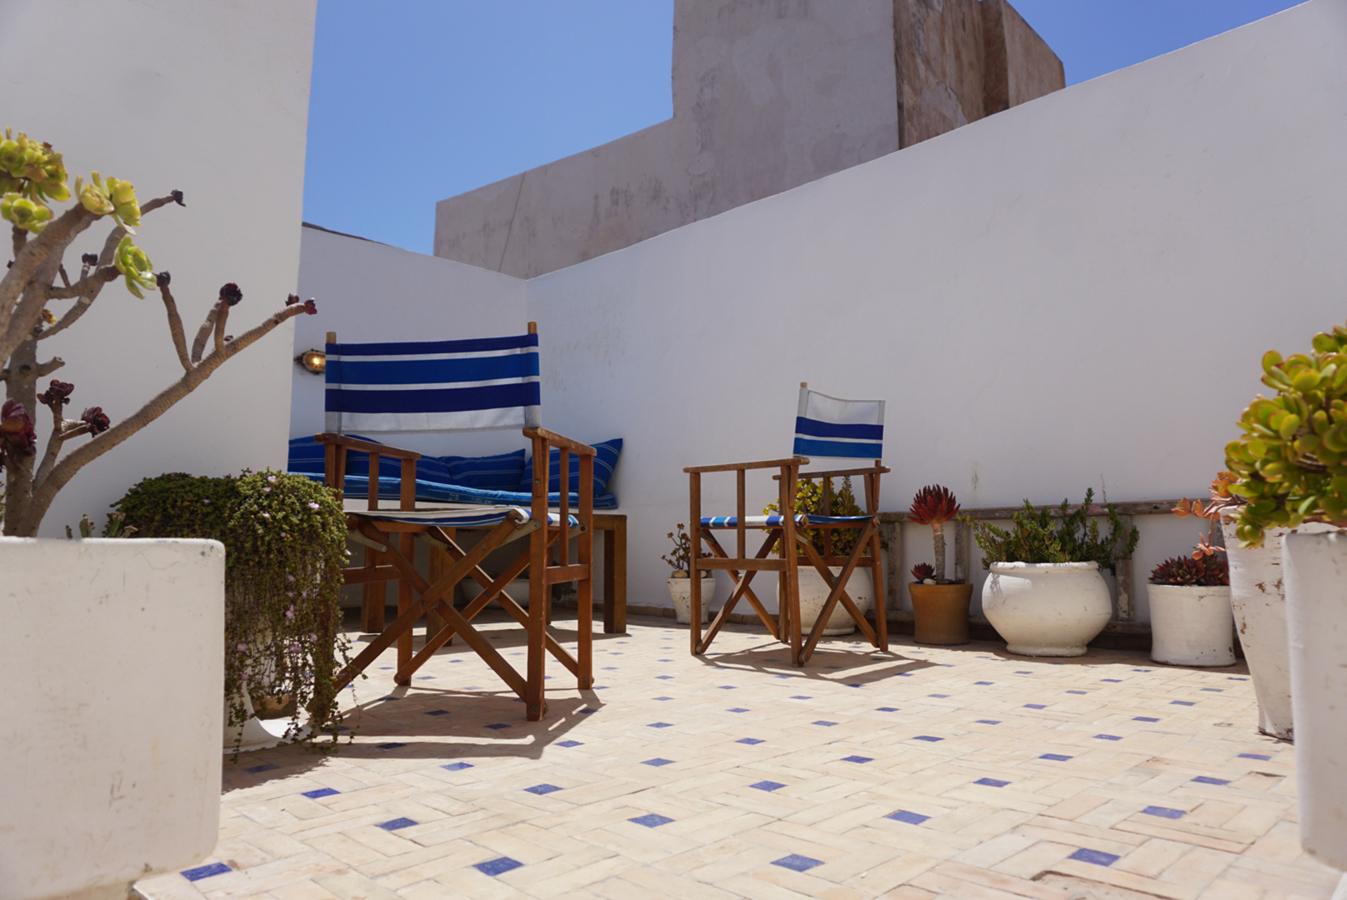 dar-emma-roof-terrace.jpg